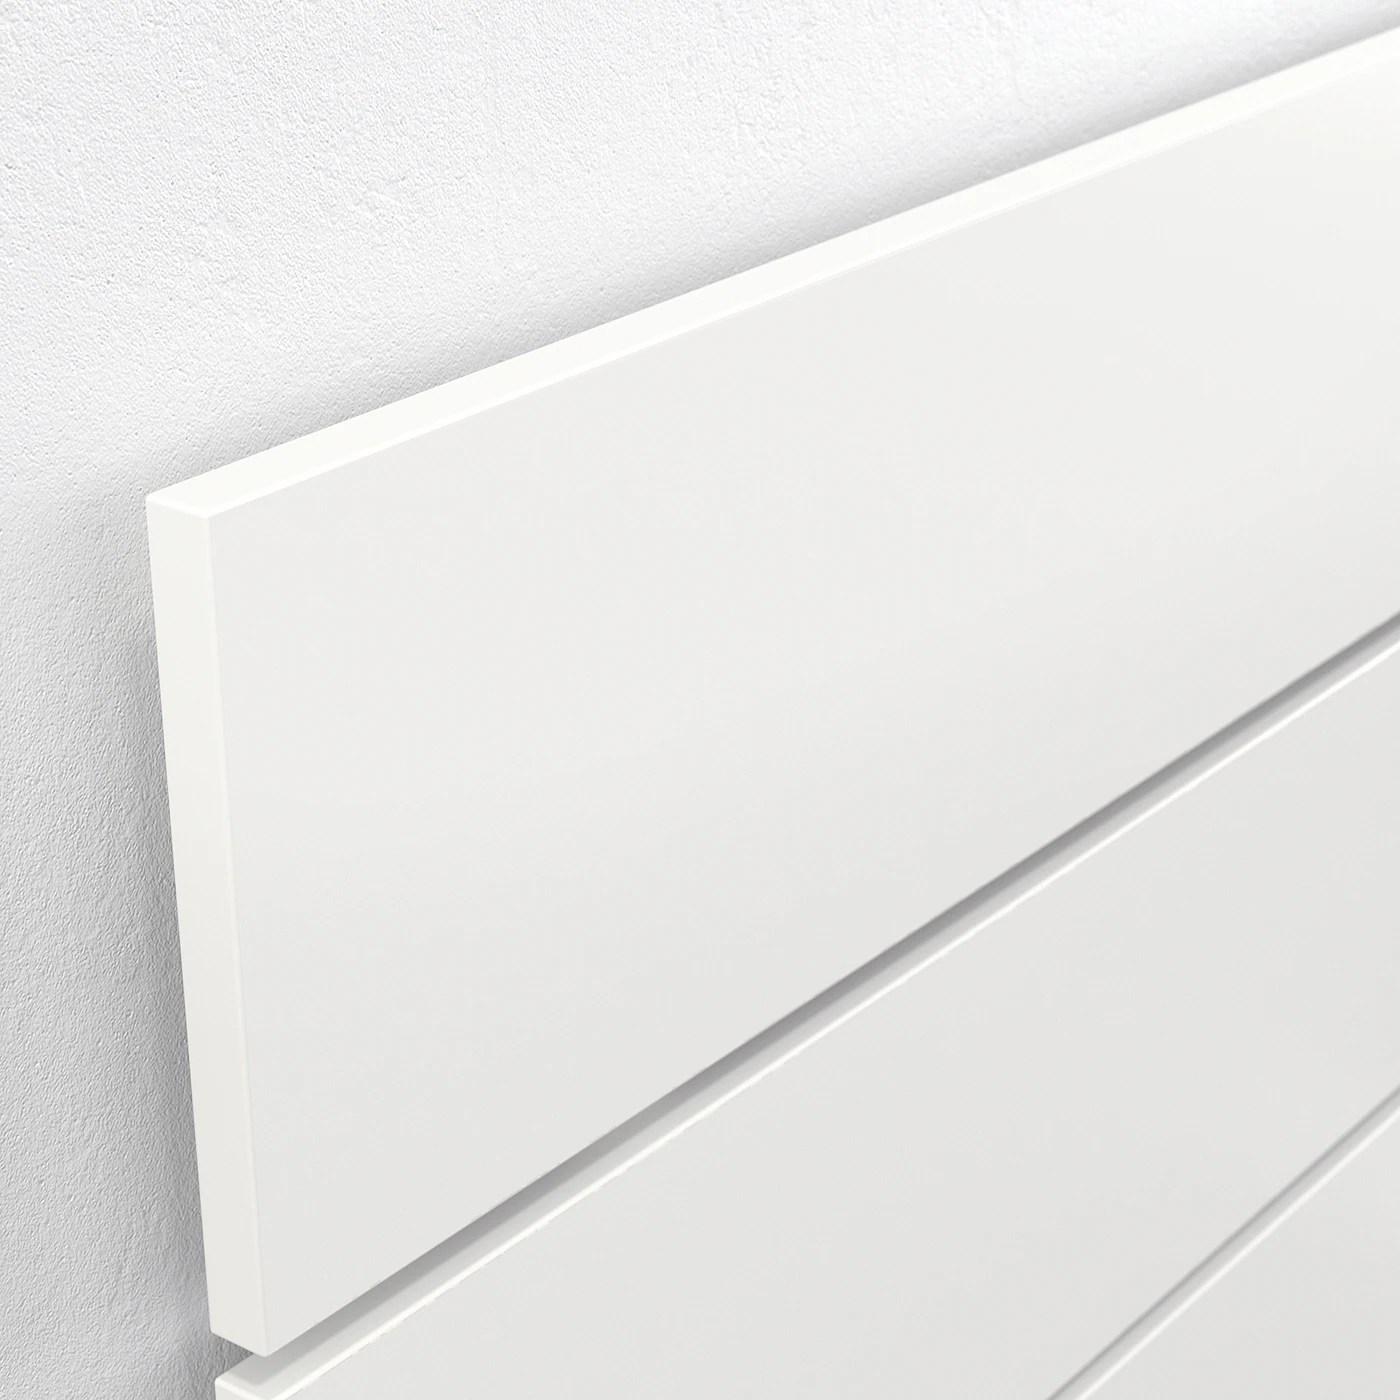 Nordli Headboard White 180 193 Cm Ikea